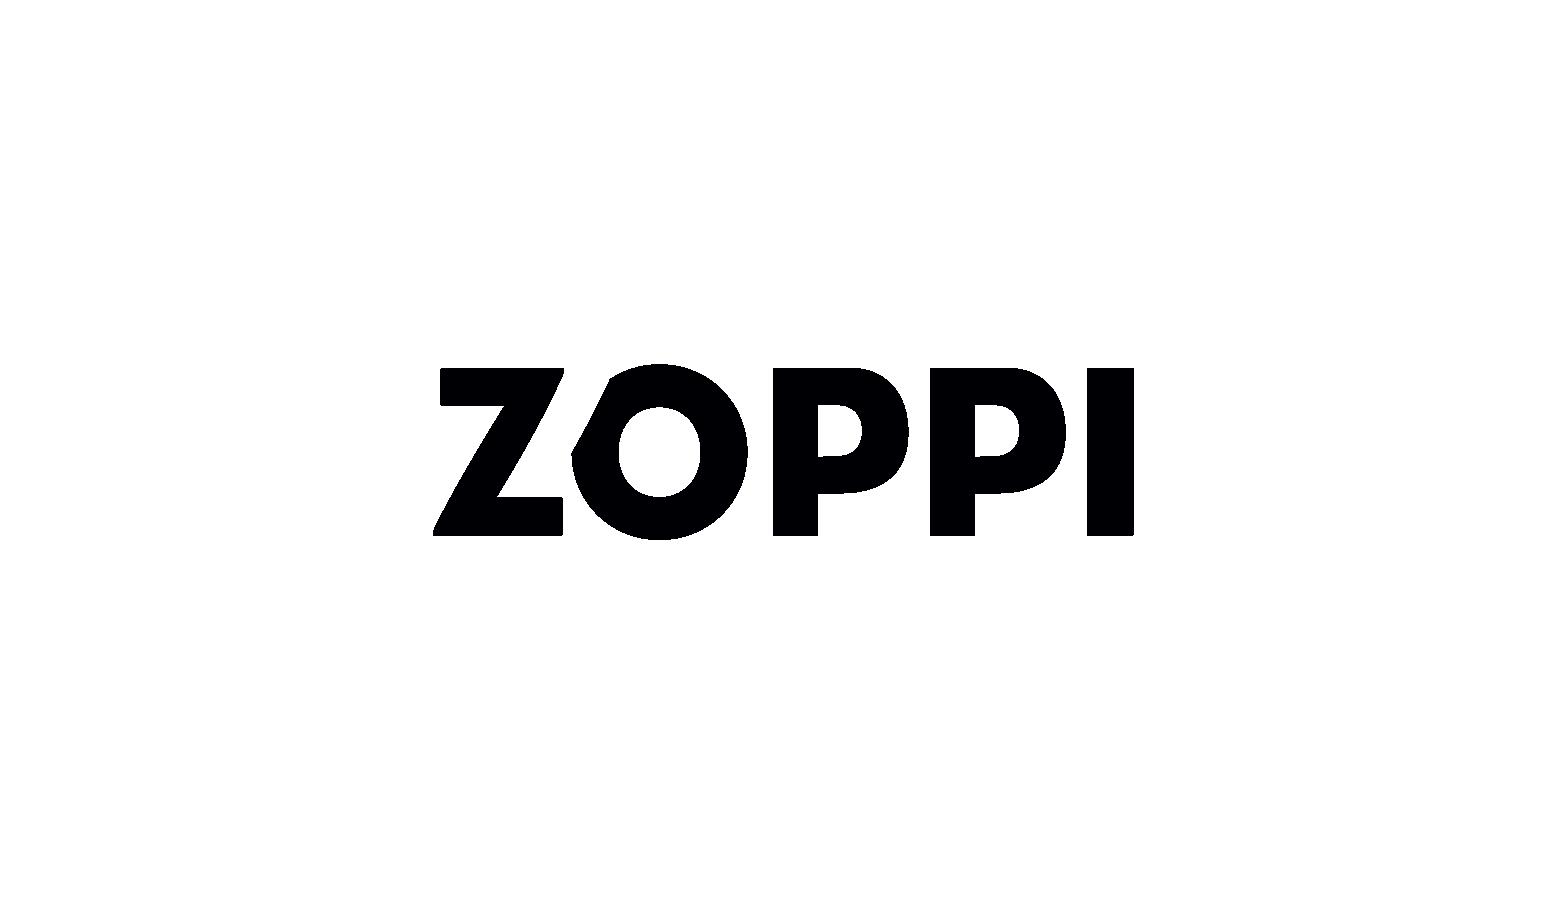 Zoppi